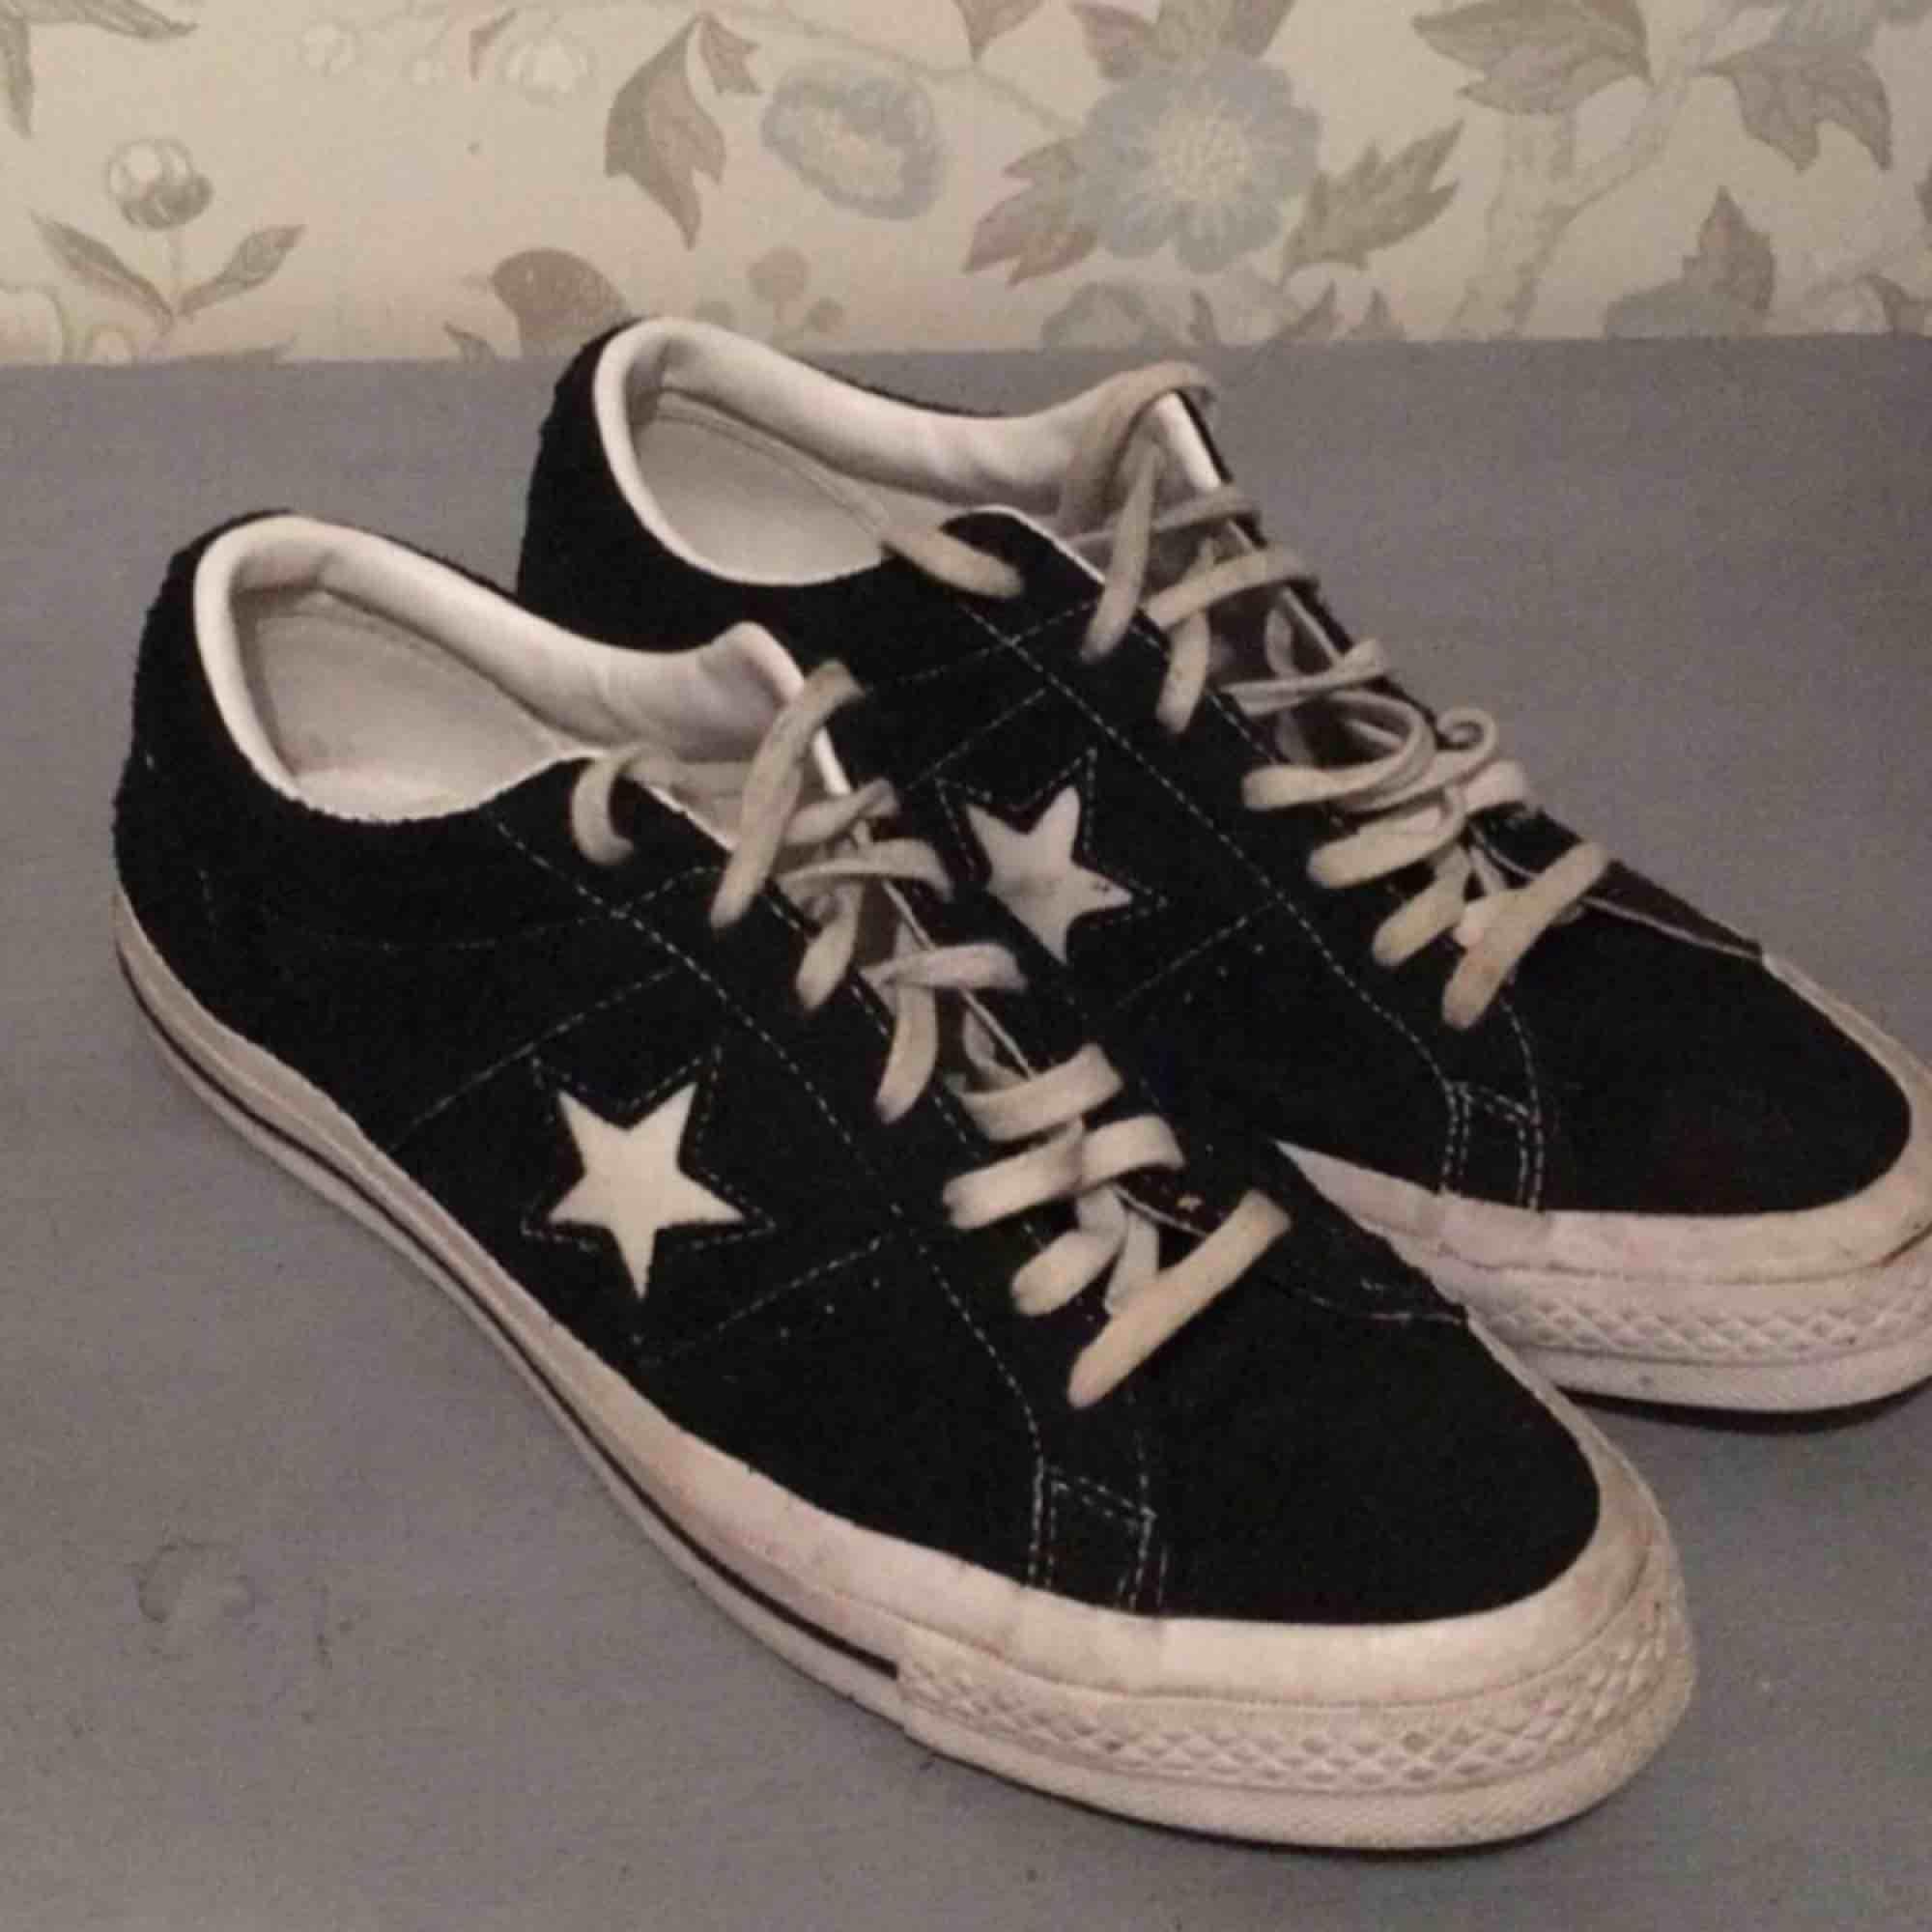 the latest 7a168 be133 Converse One Star Ox, köpta på UO. Nypris 800kr. Storlek 42 men passar